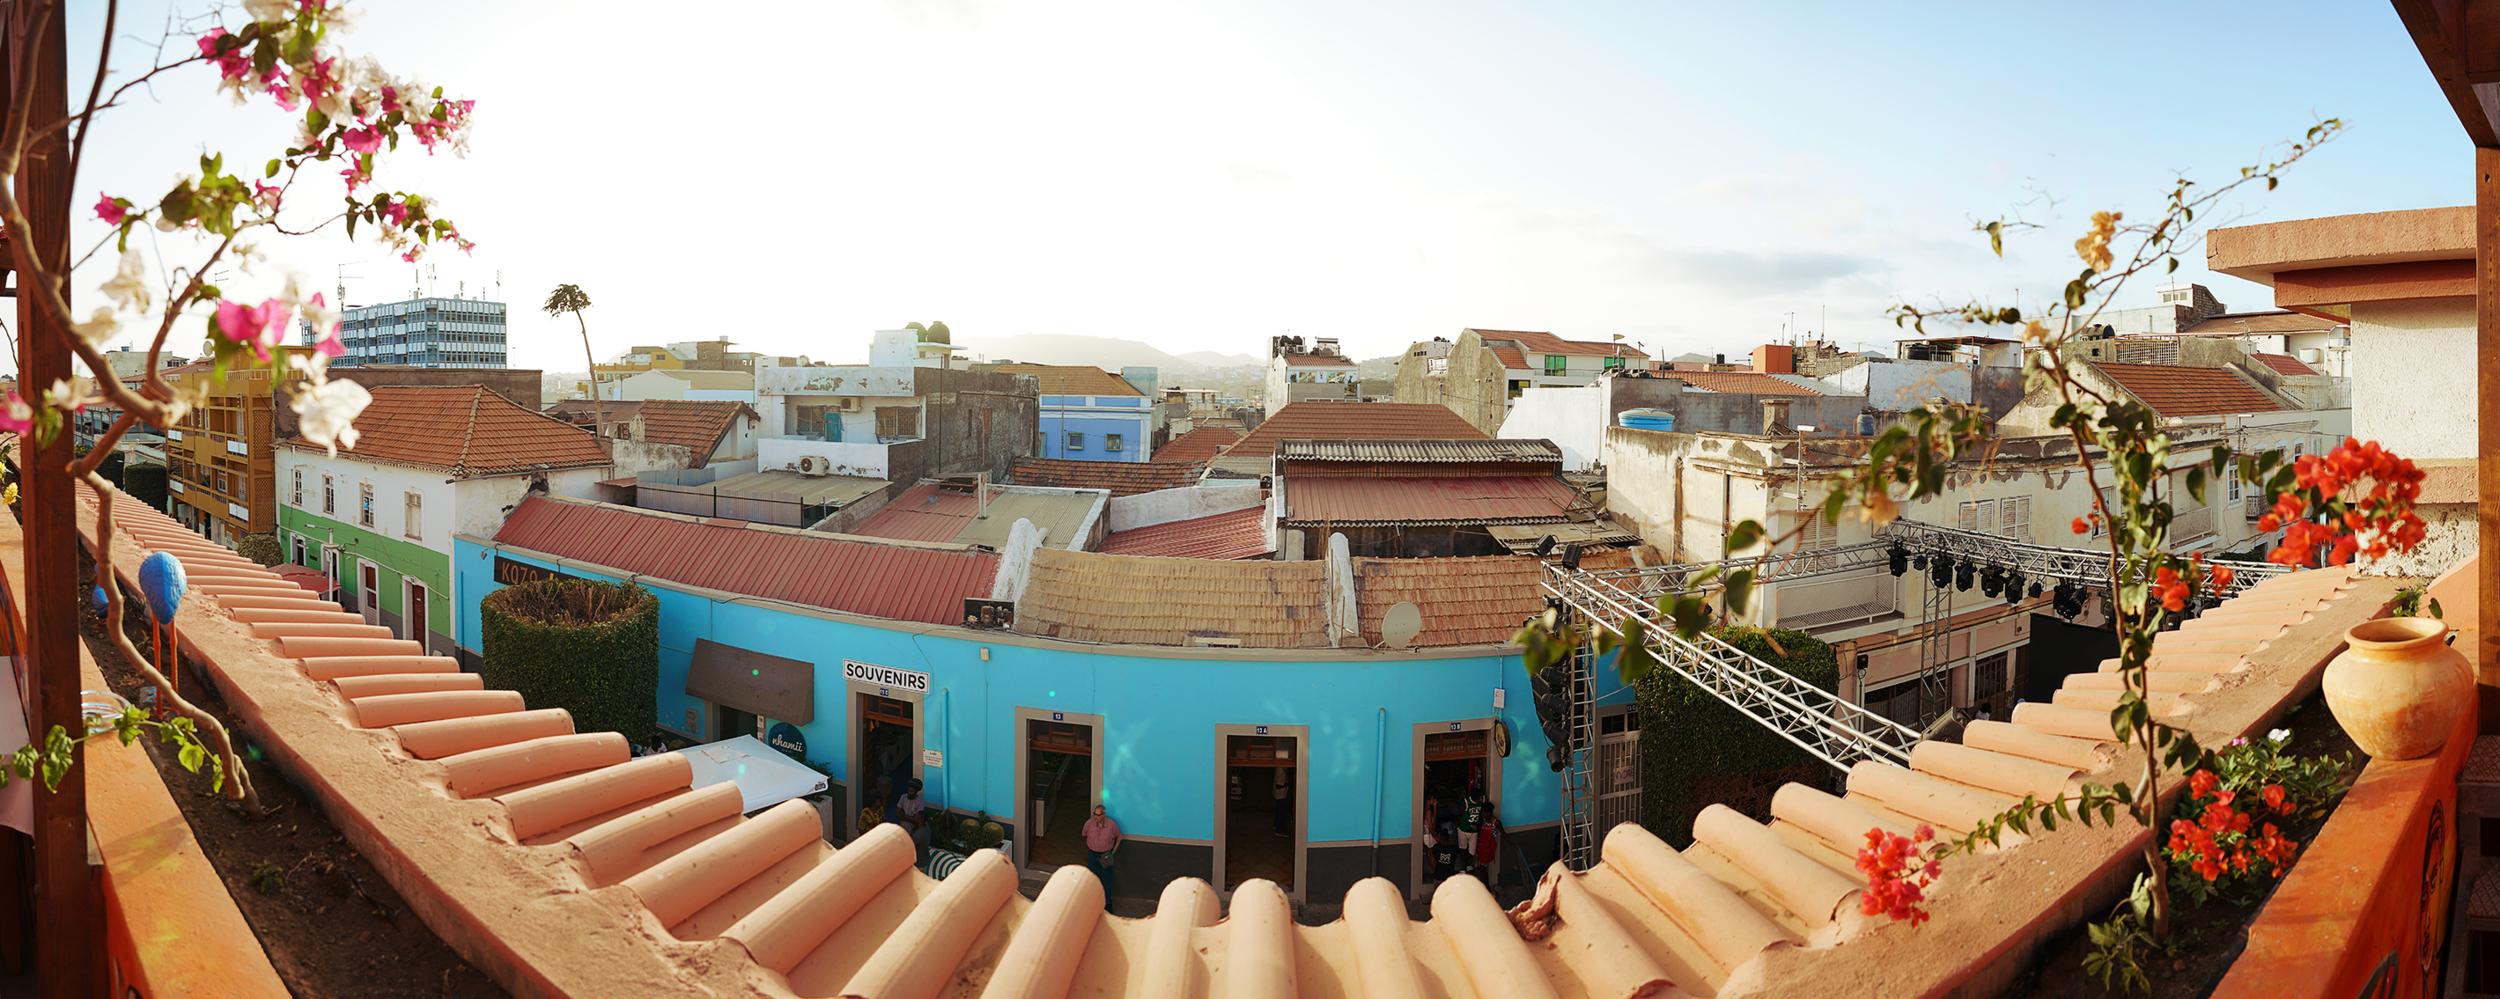 Praiia_Maria_Panorama_Roof_20190412_Lres.png